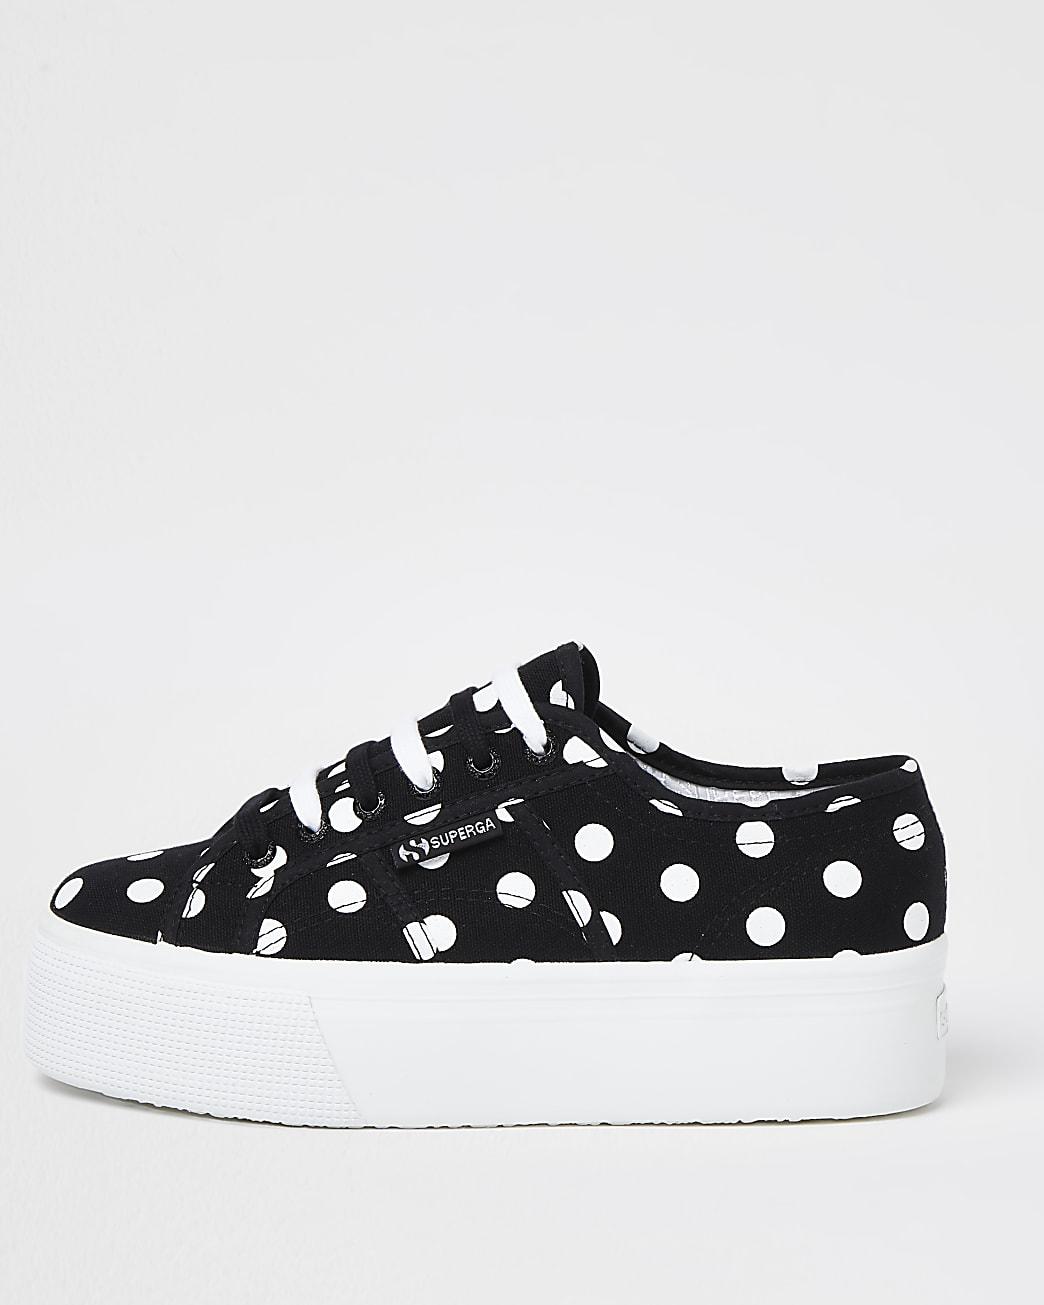 Superga black polka dot flatform trainers